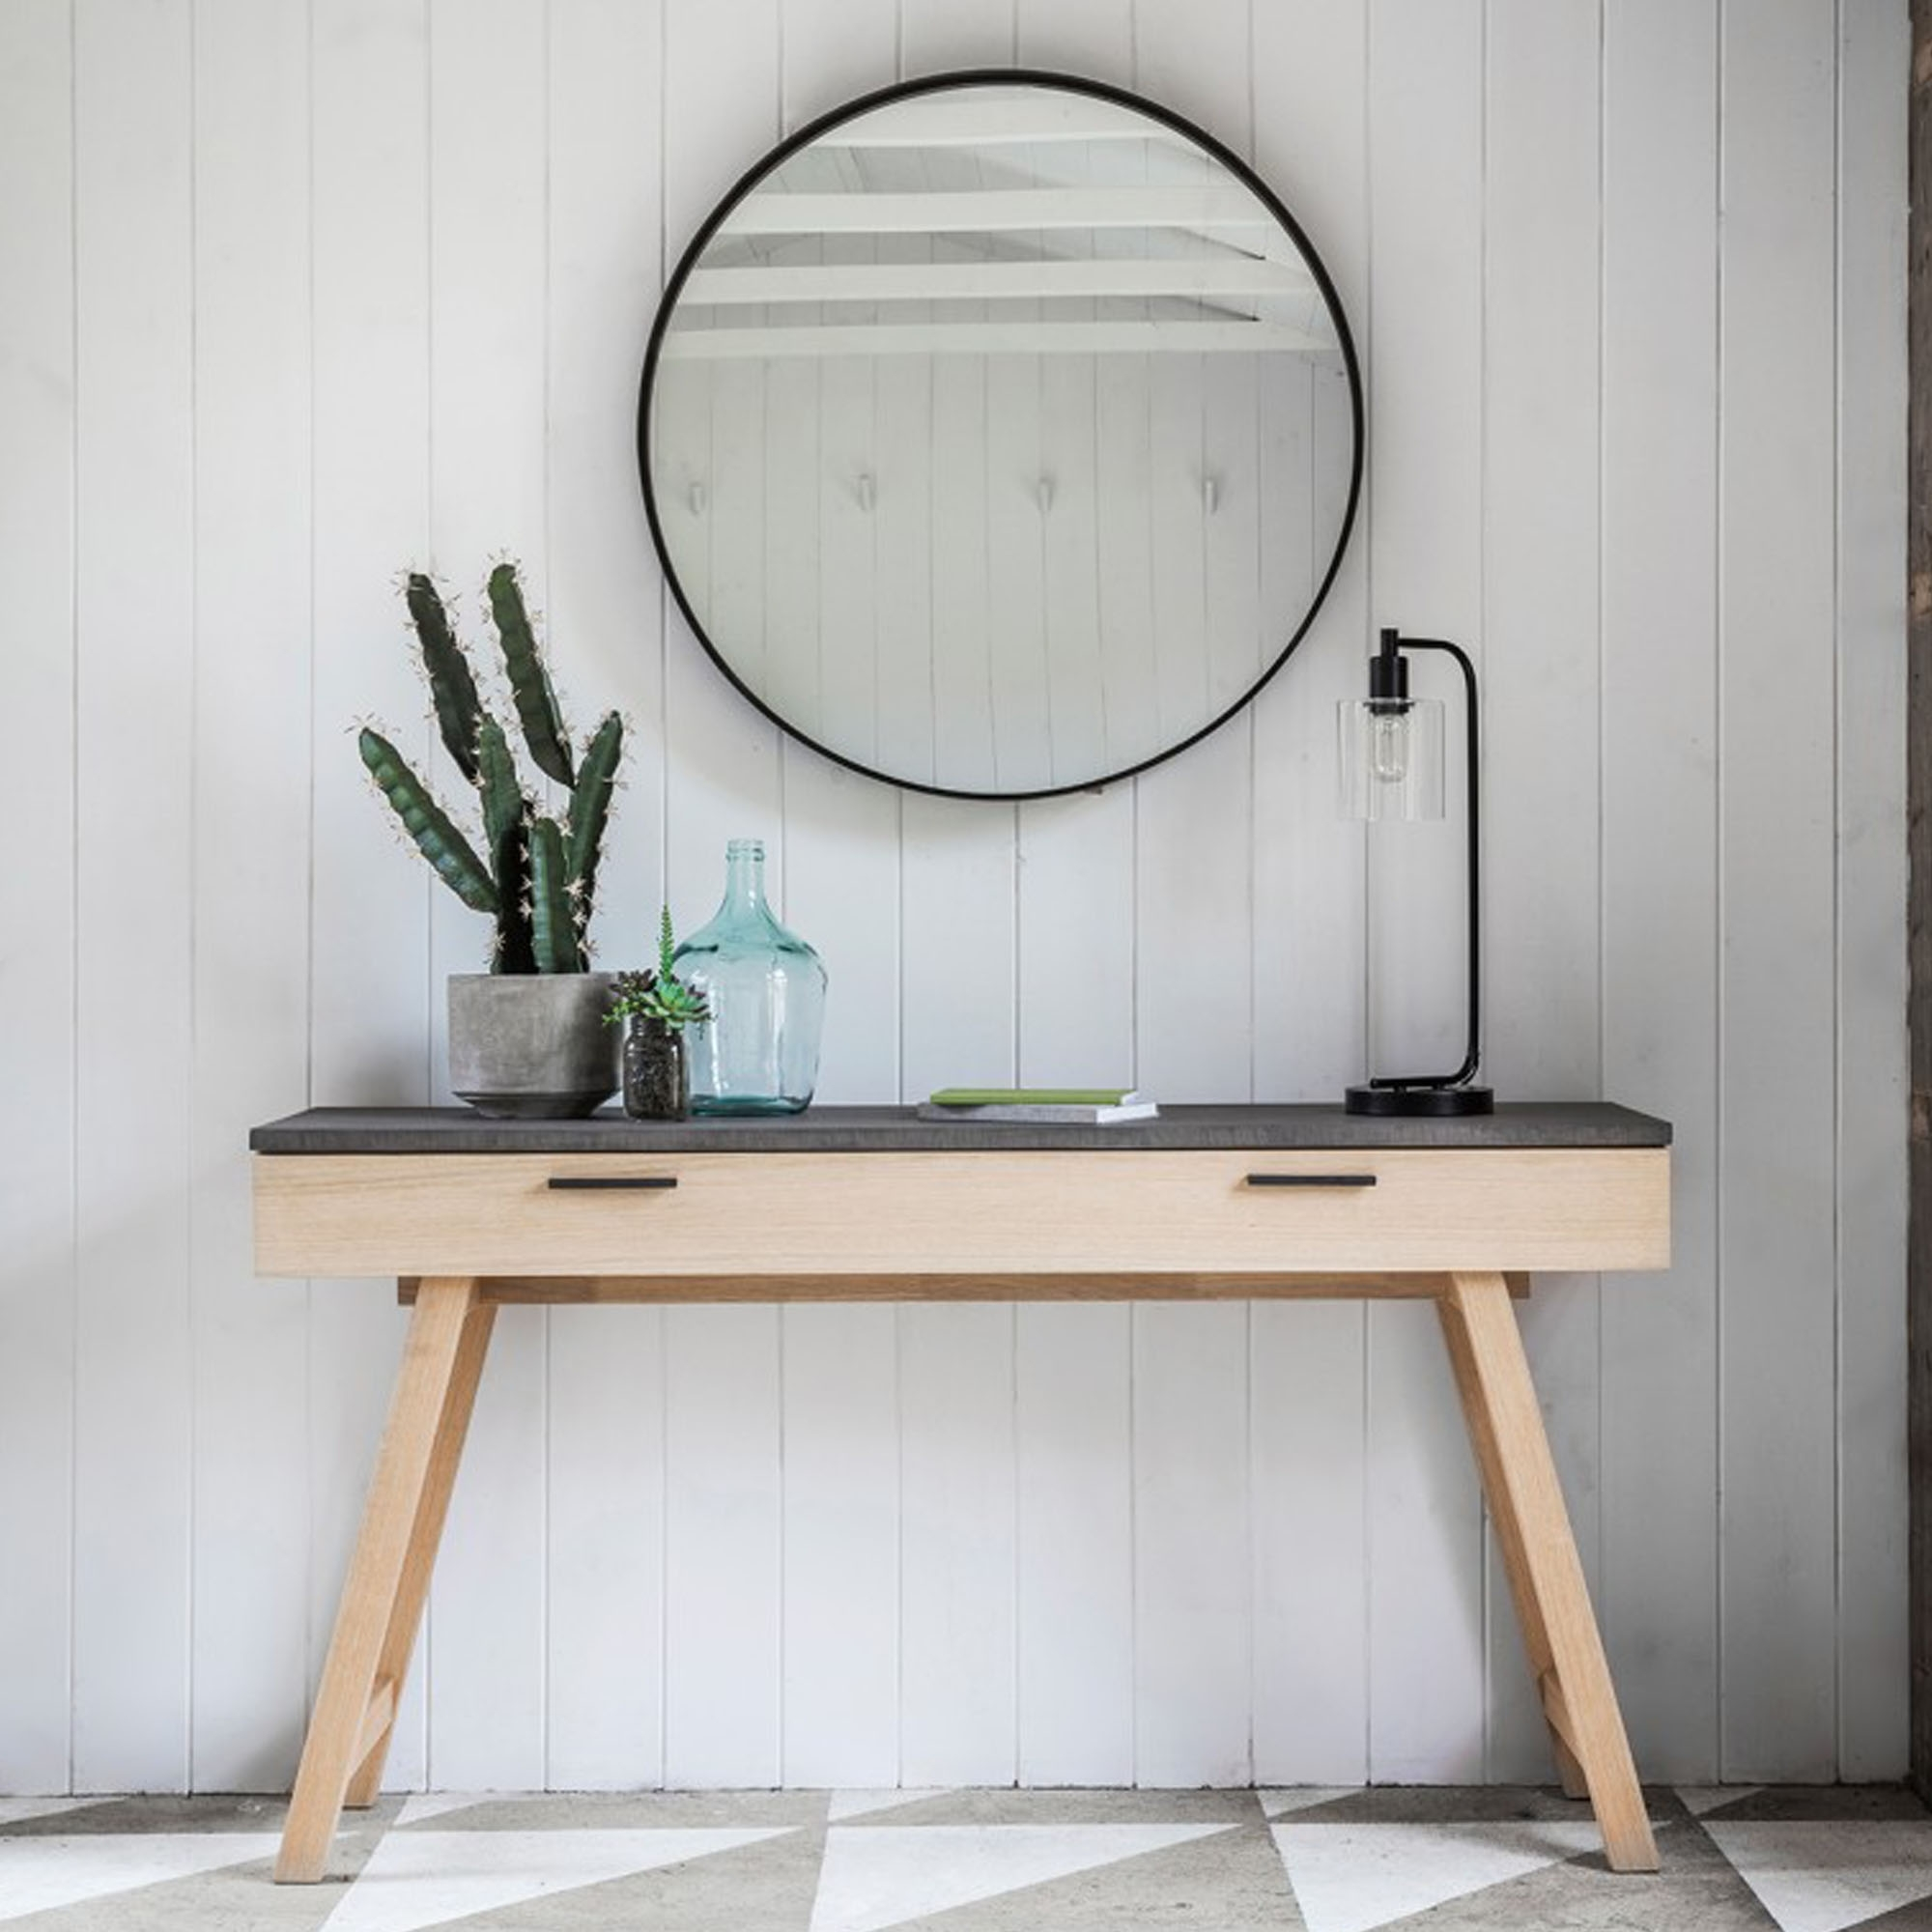 Prime Chilson 1 Drawer Console Table Inzonedesignstudio Interior Chair Design Inzonedesignstudiocom